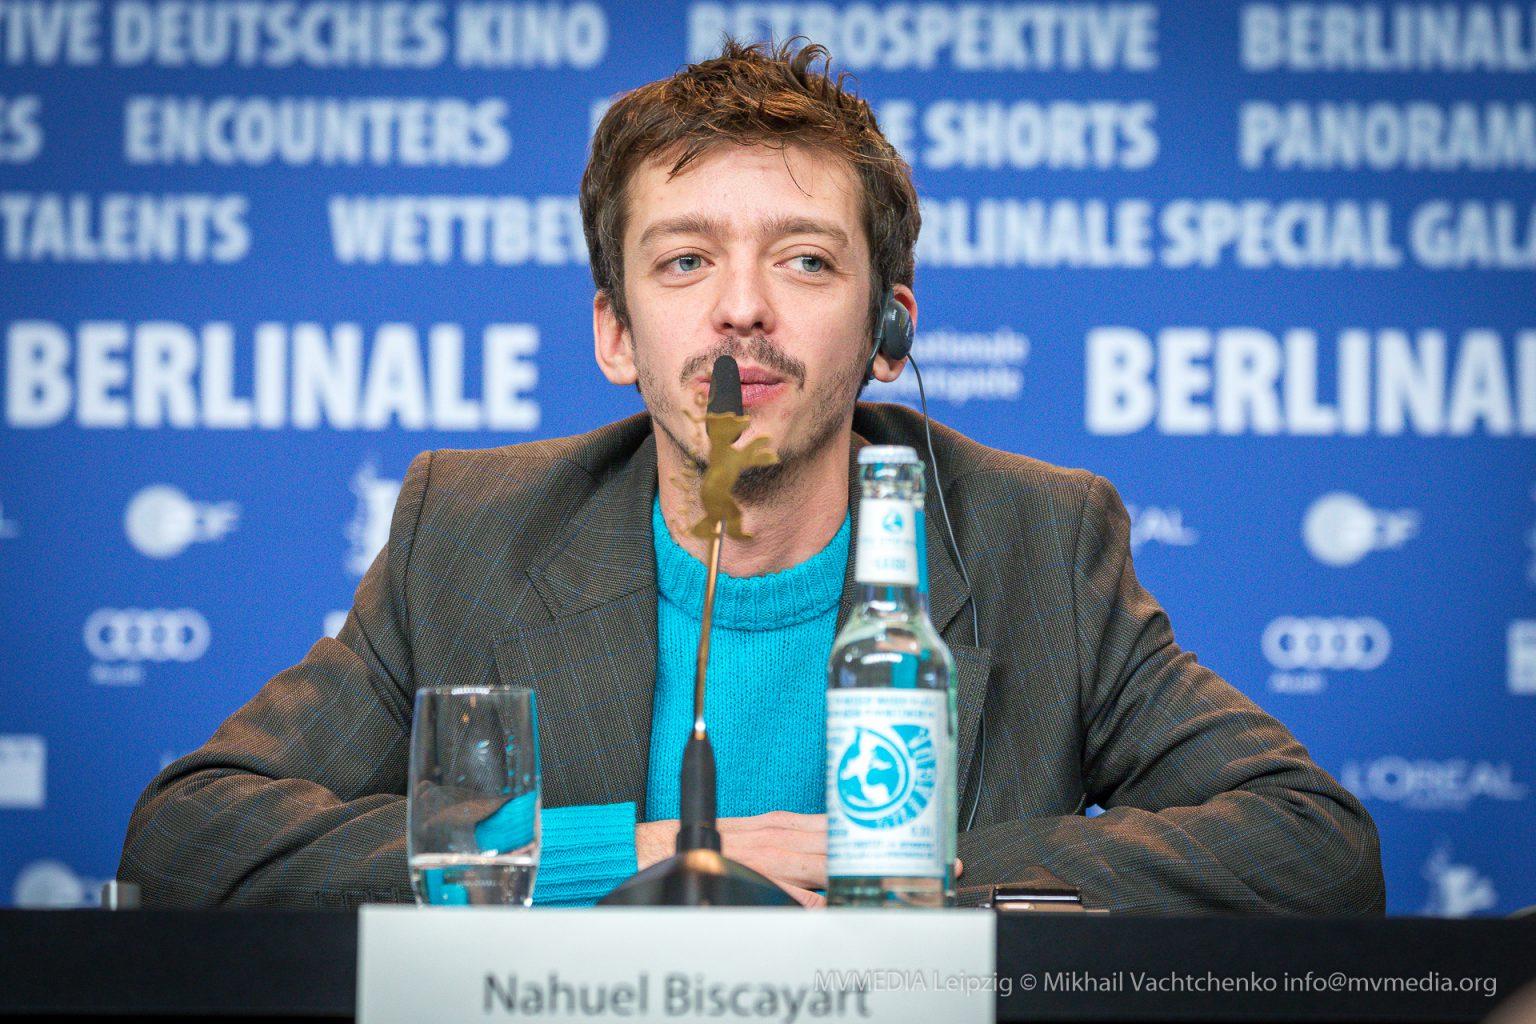 Nahuel Pérez Biscayart Pressekonferenz Berlinale